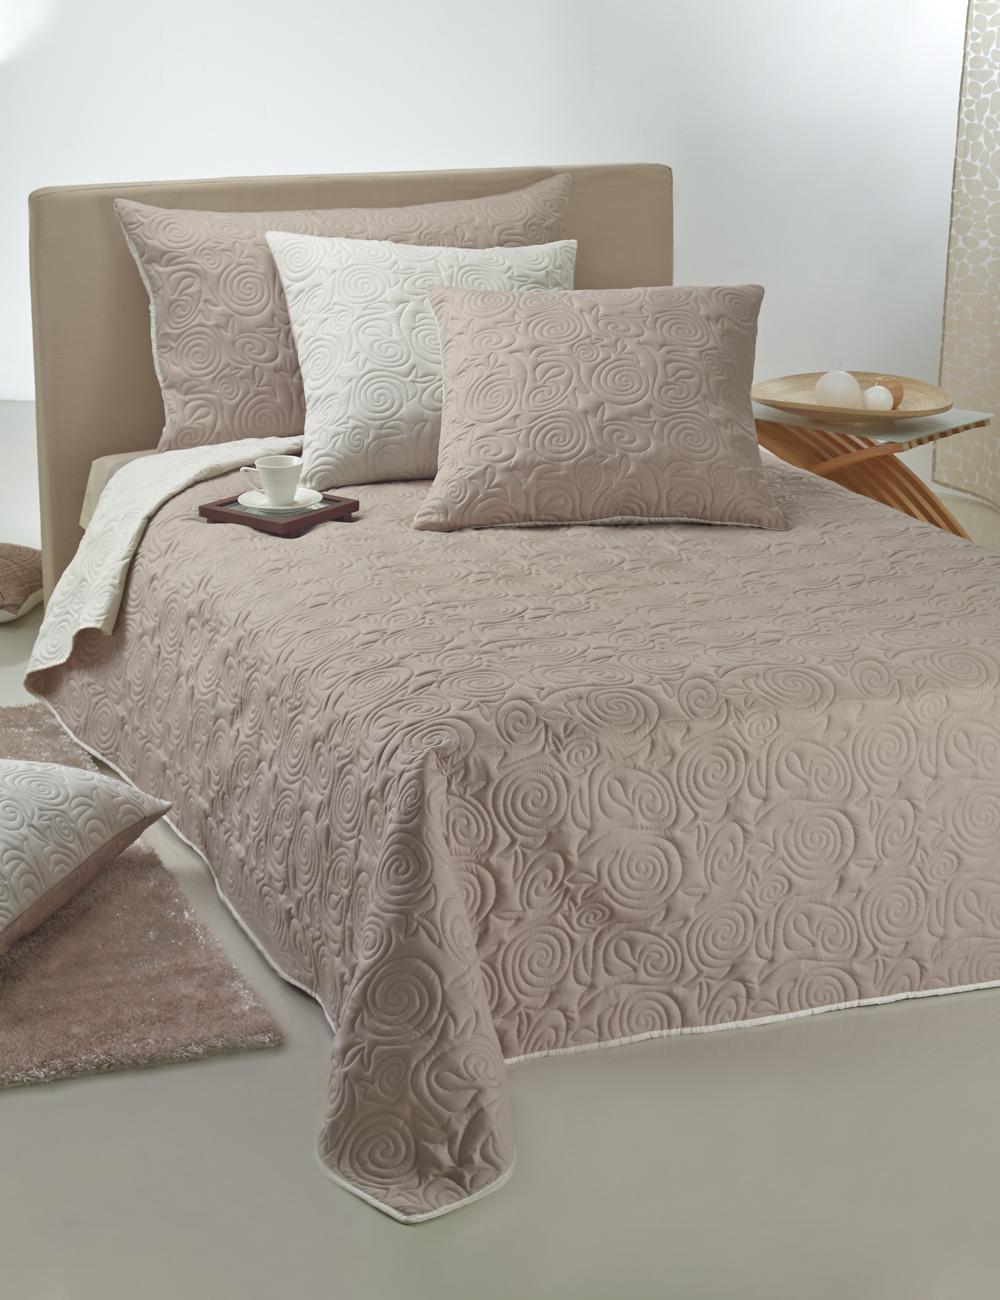 couvre lit ultrasonic 240 x 260 cm ivoire taupe. Black Bedroom Furniture Sets. Home Design Ideas